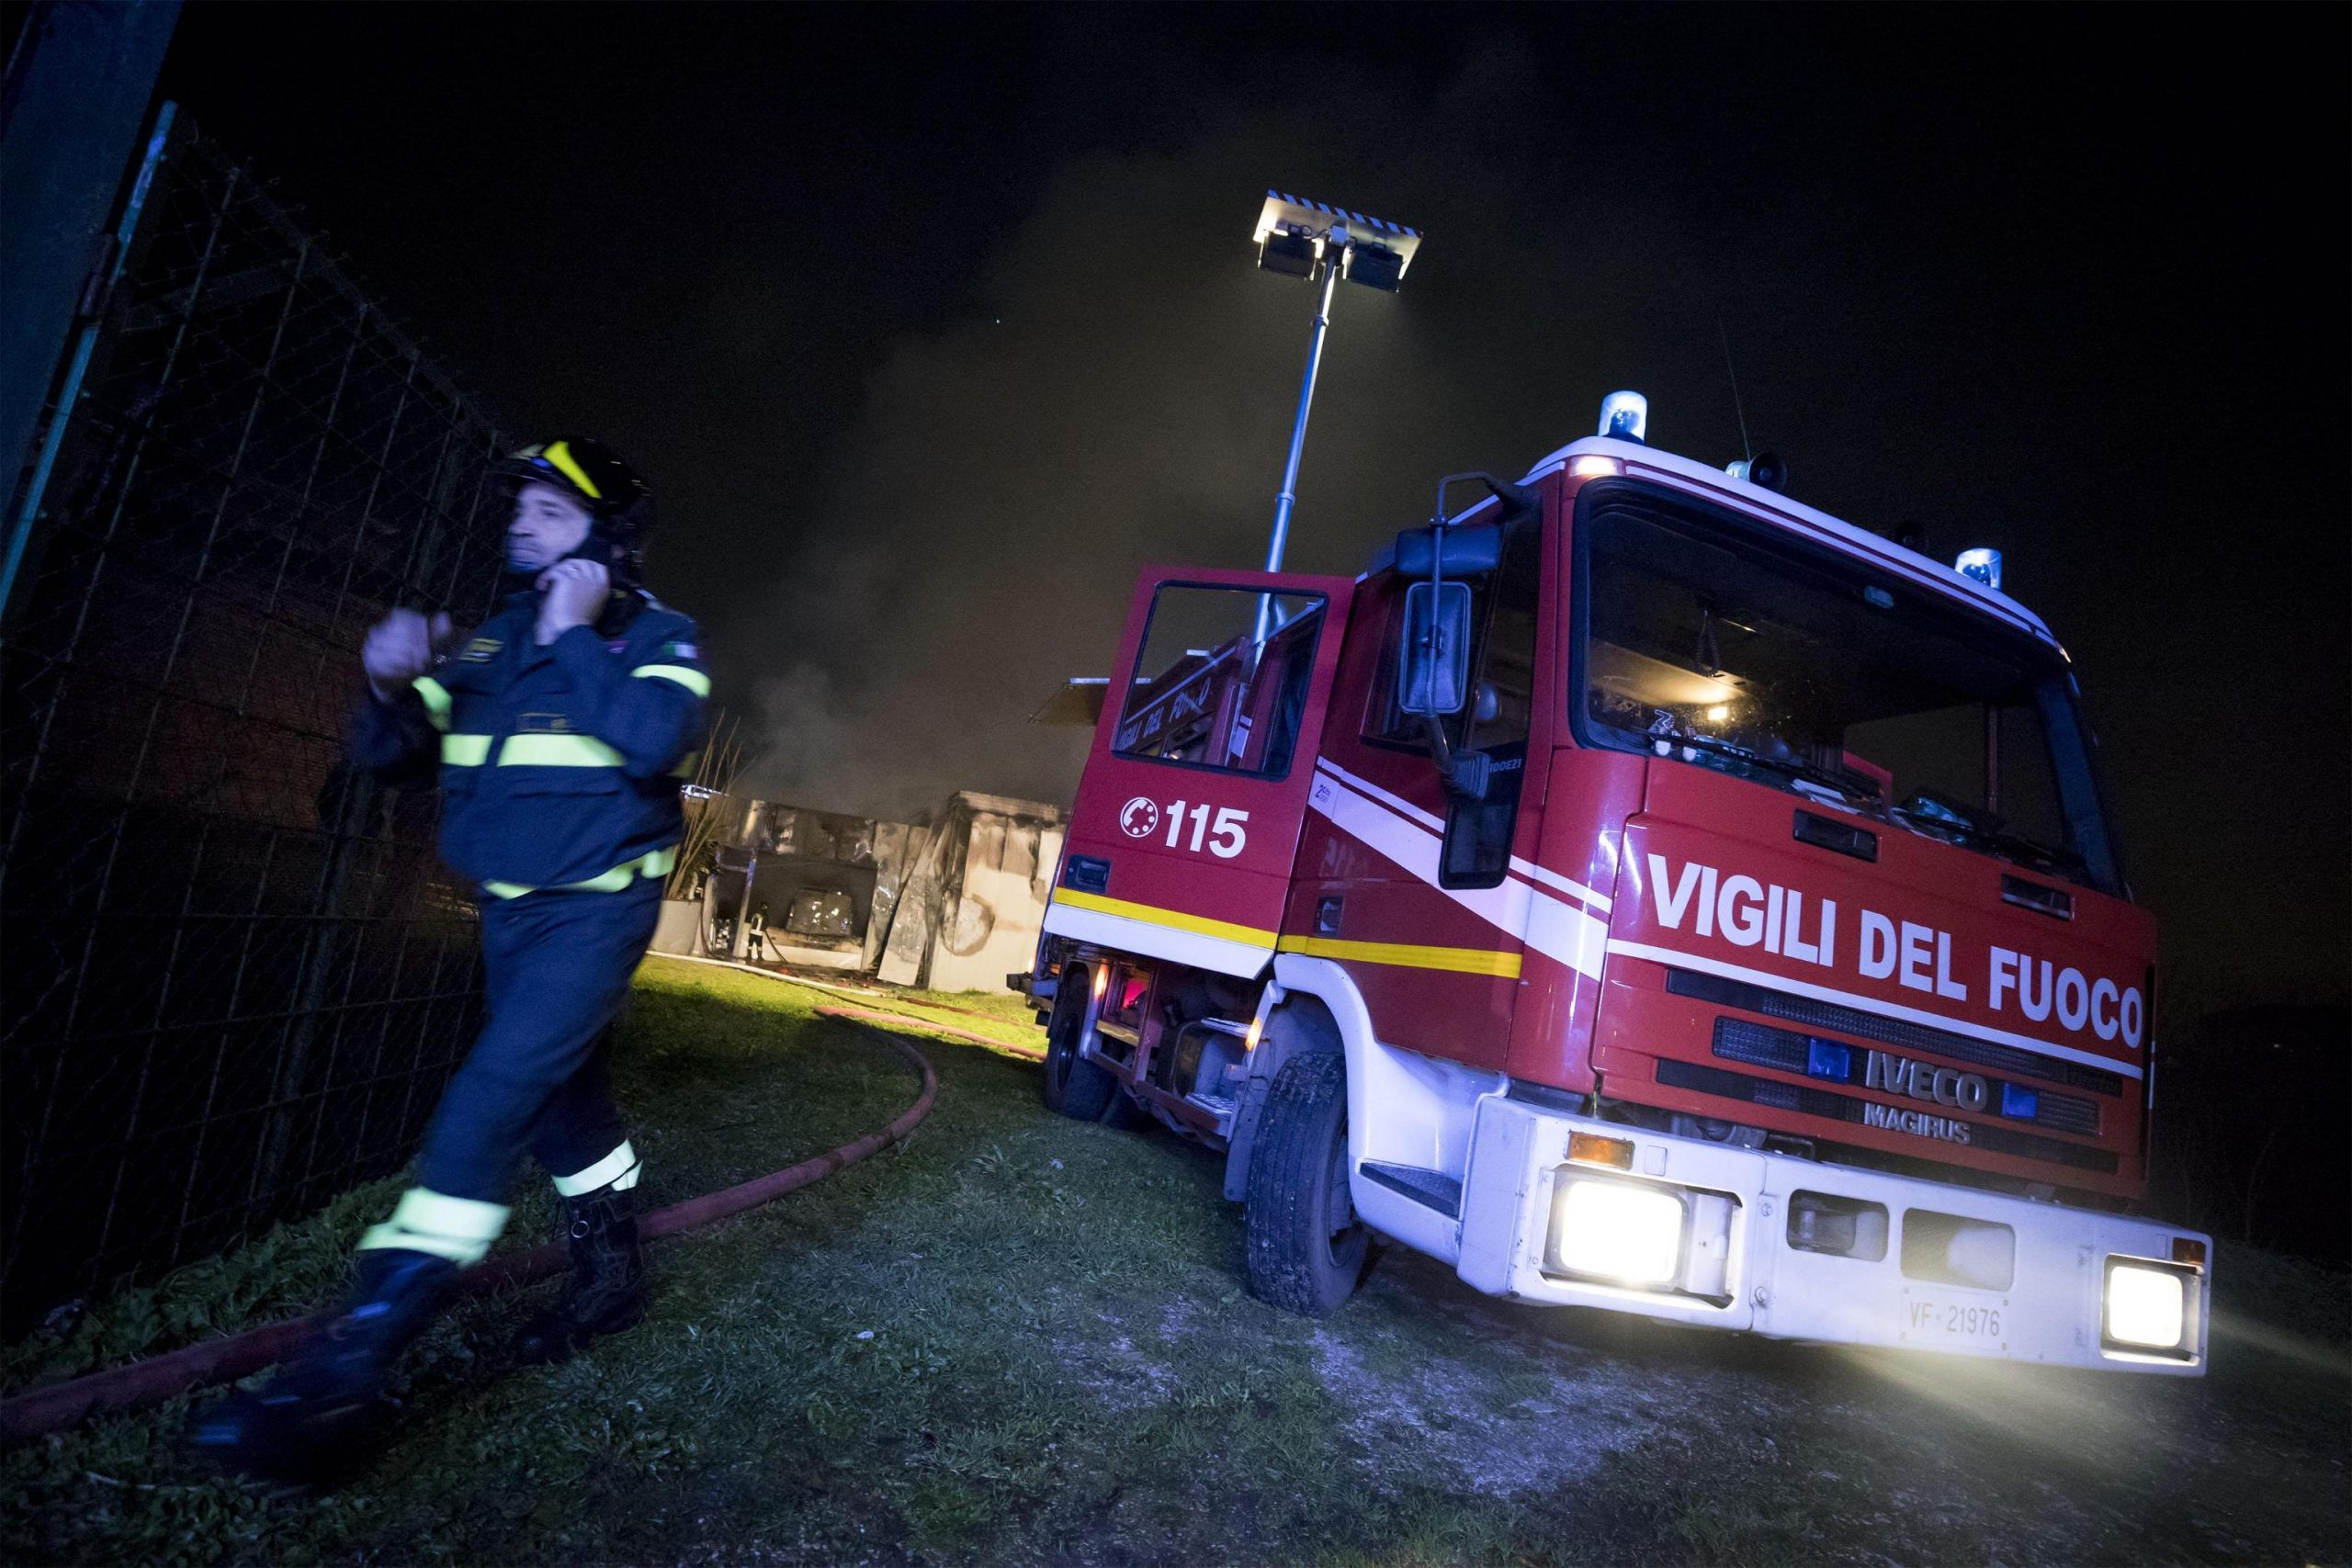 Capannone in fiamme a Roma, evacuate case per precauzione